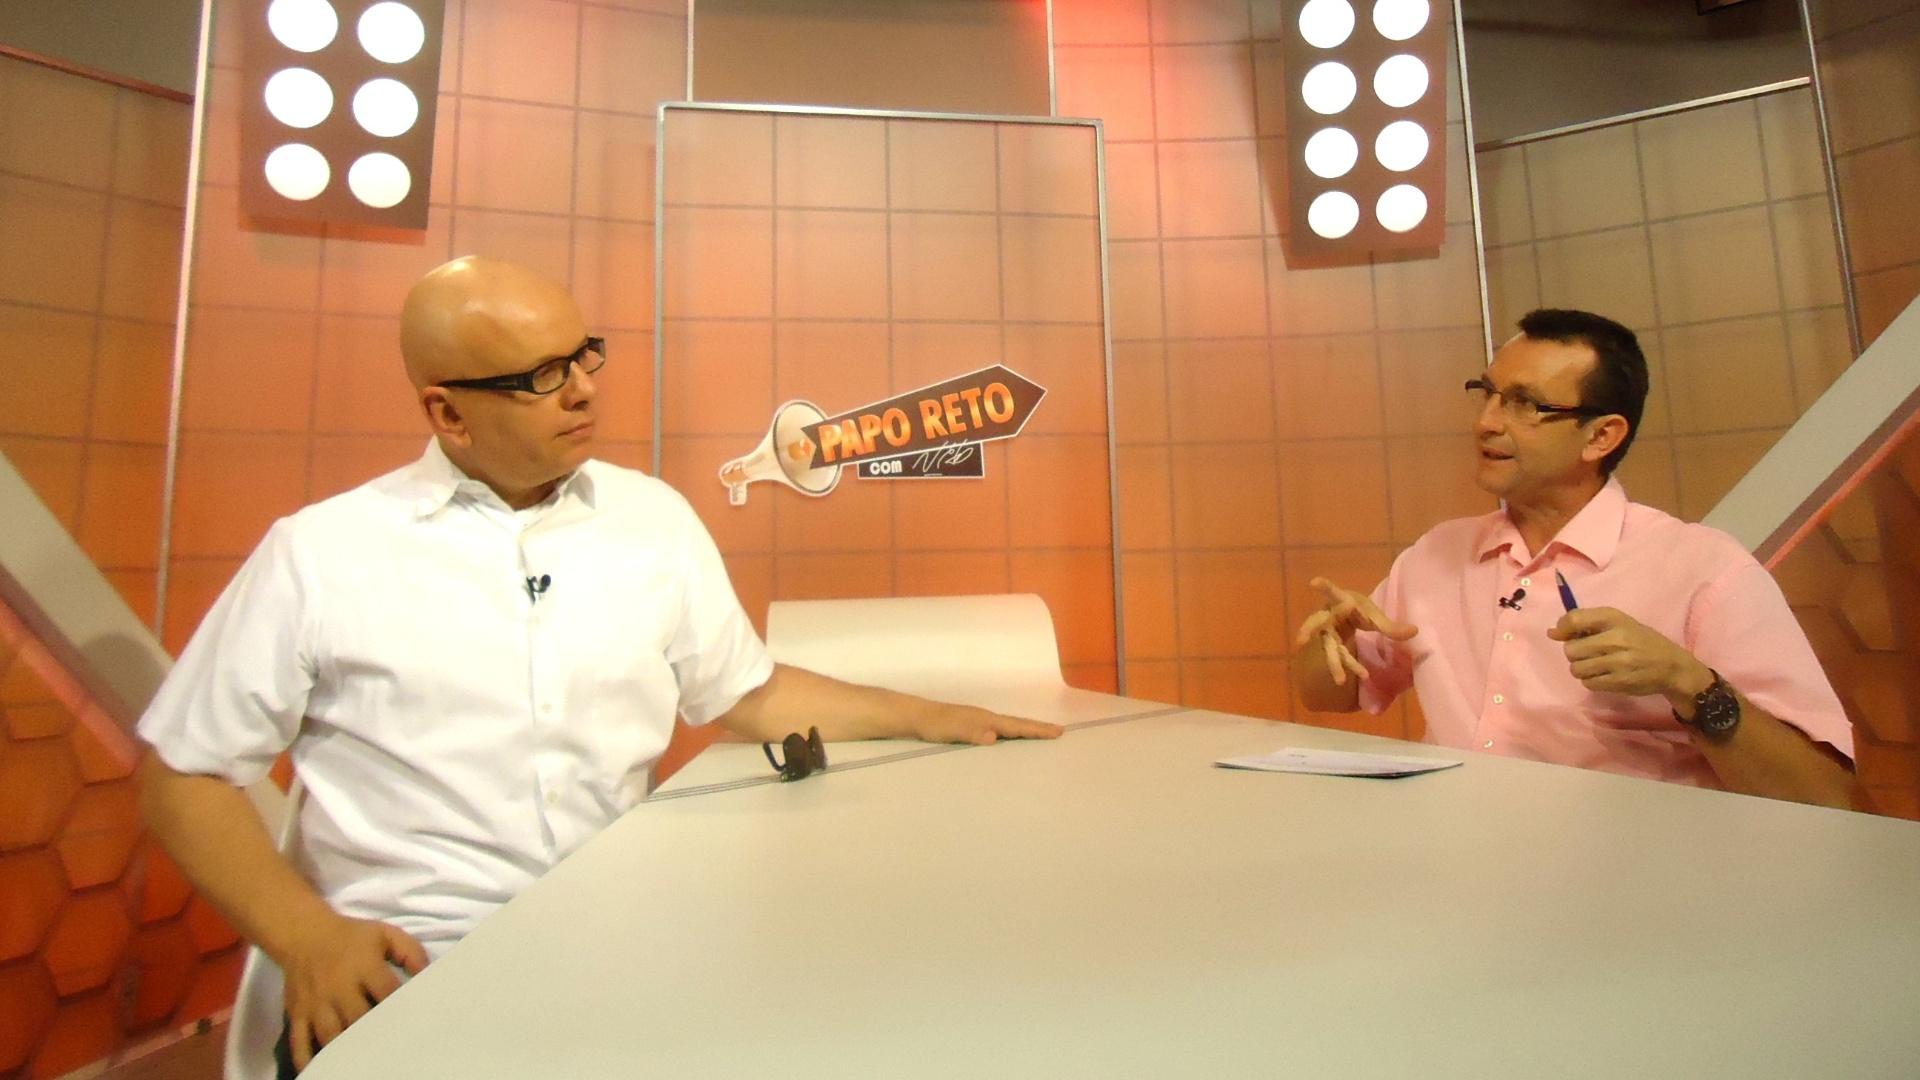 O apresentador Marcelo Tas é entrevistado por Neto no programa